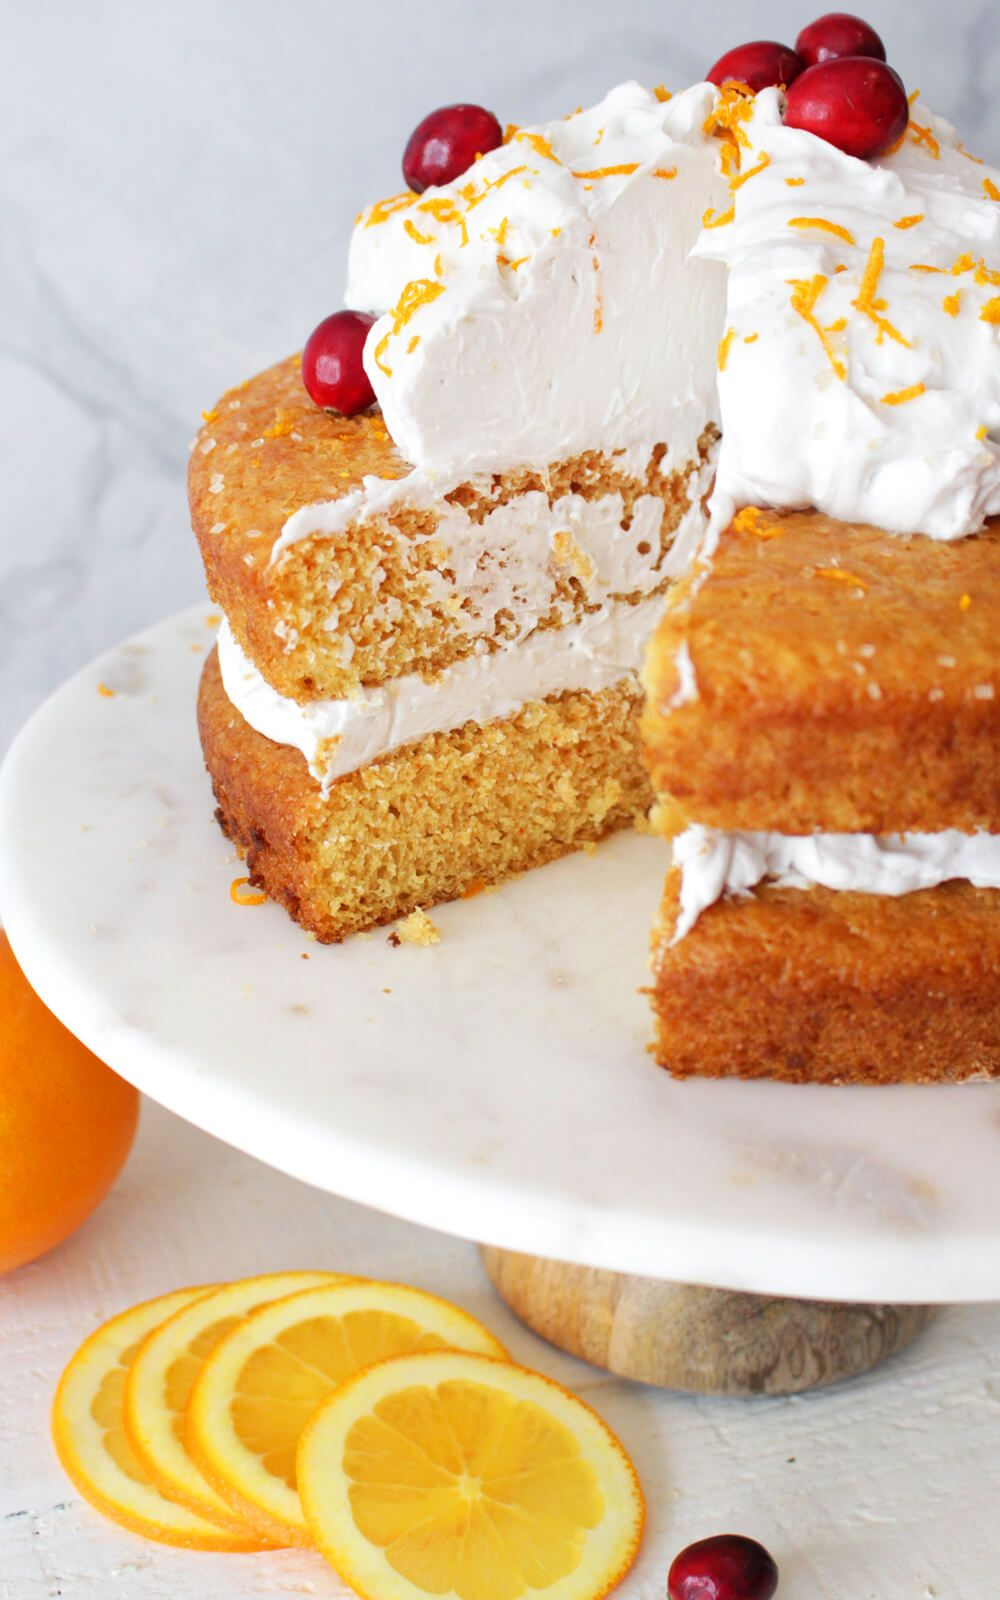 Vegan Orange Cake With Vanilla Coconut Whip Frosting Recipe Vegan Orange Cake Recipe Orange Cake Recipe Orange Cake